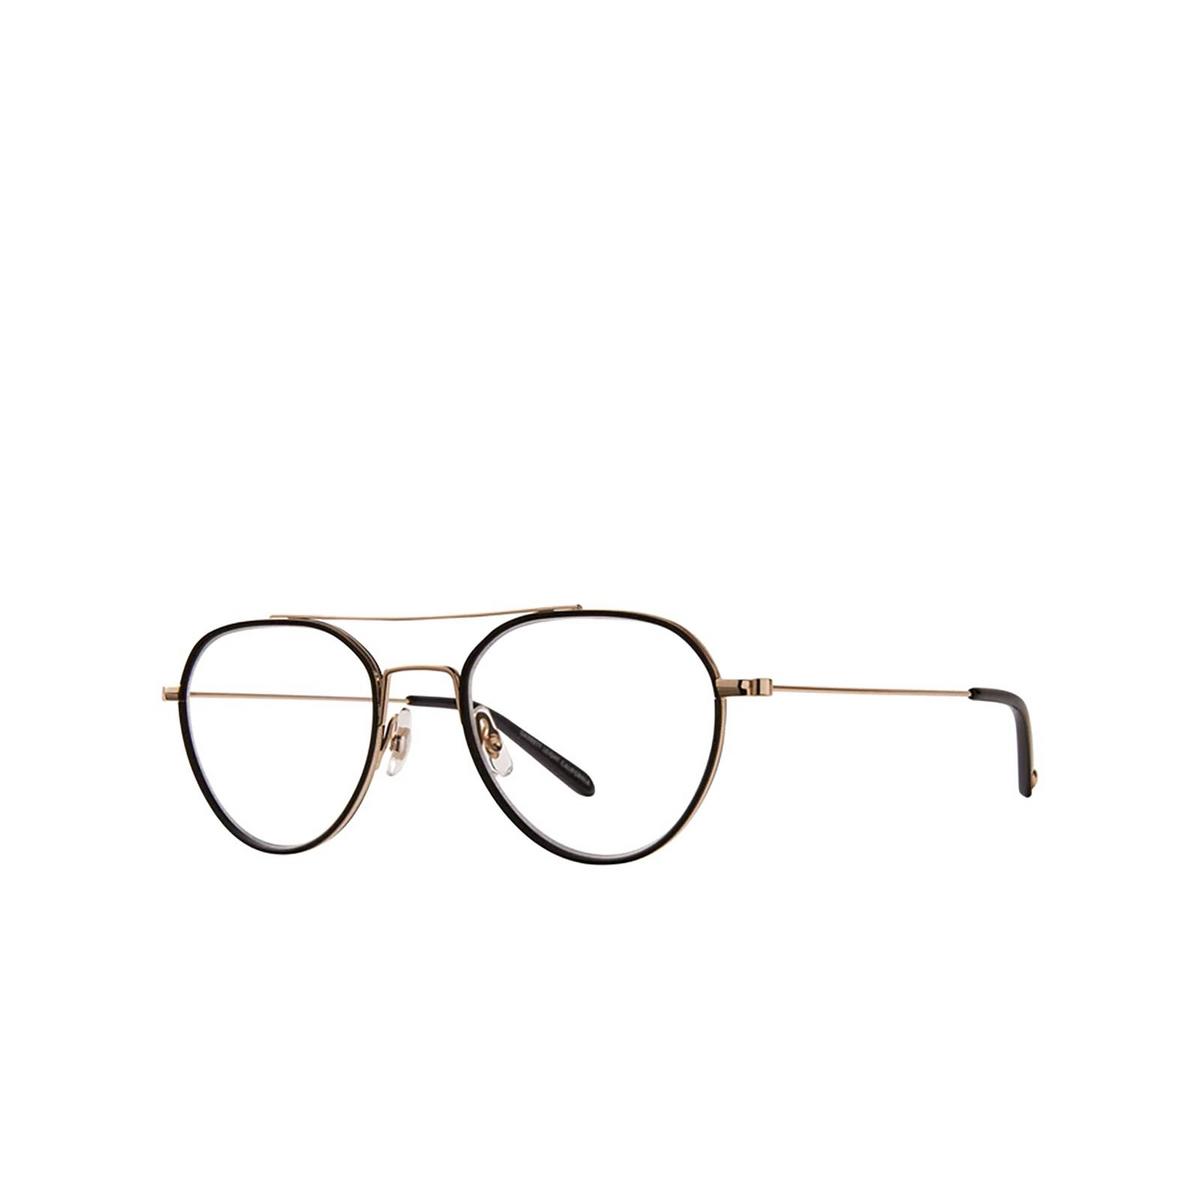 Garrett Leight® Aviator Eyeglasses: San Miguel color Matte Black-gold Mbk-g-bk.